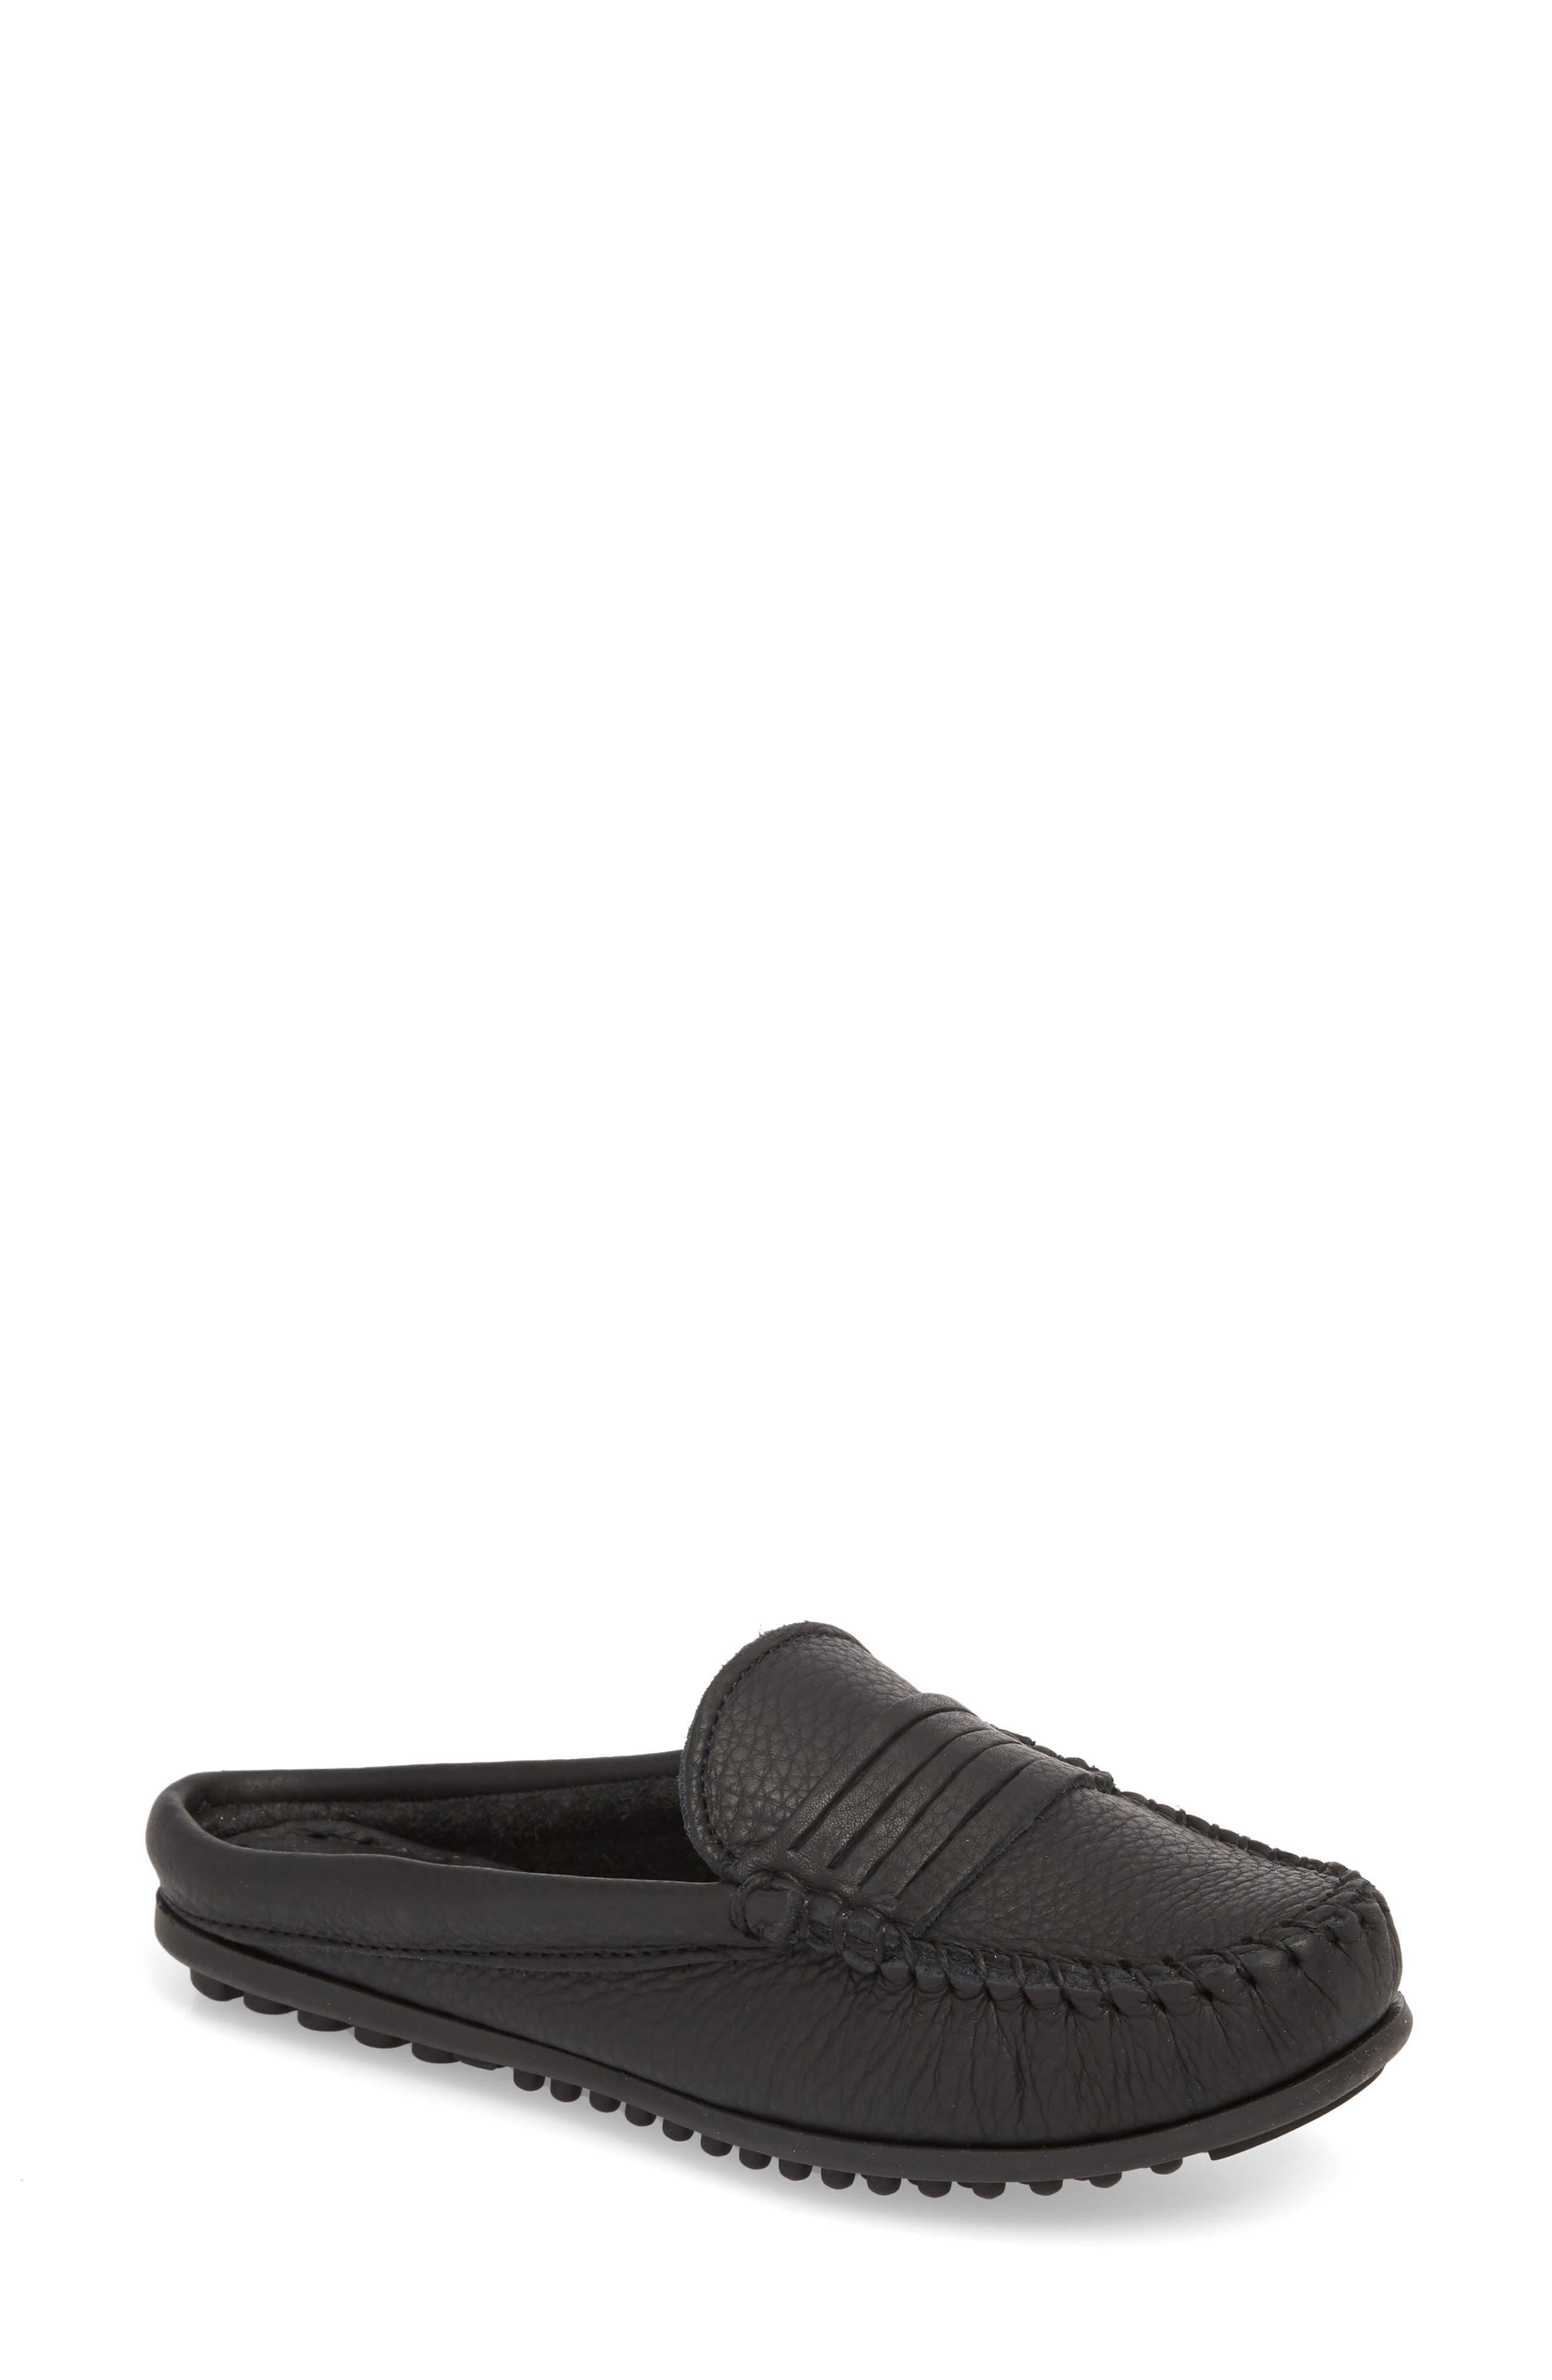 MINNETONKA Kate Moc Toe Loafer Mule, Main, color, BLACK